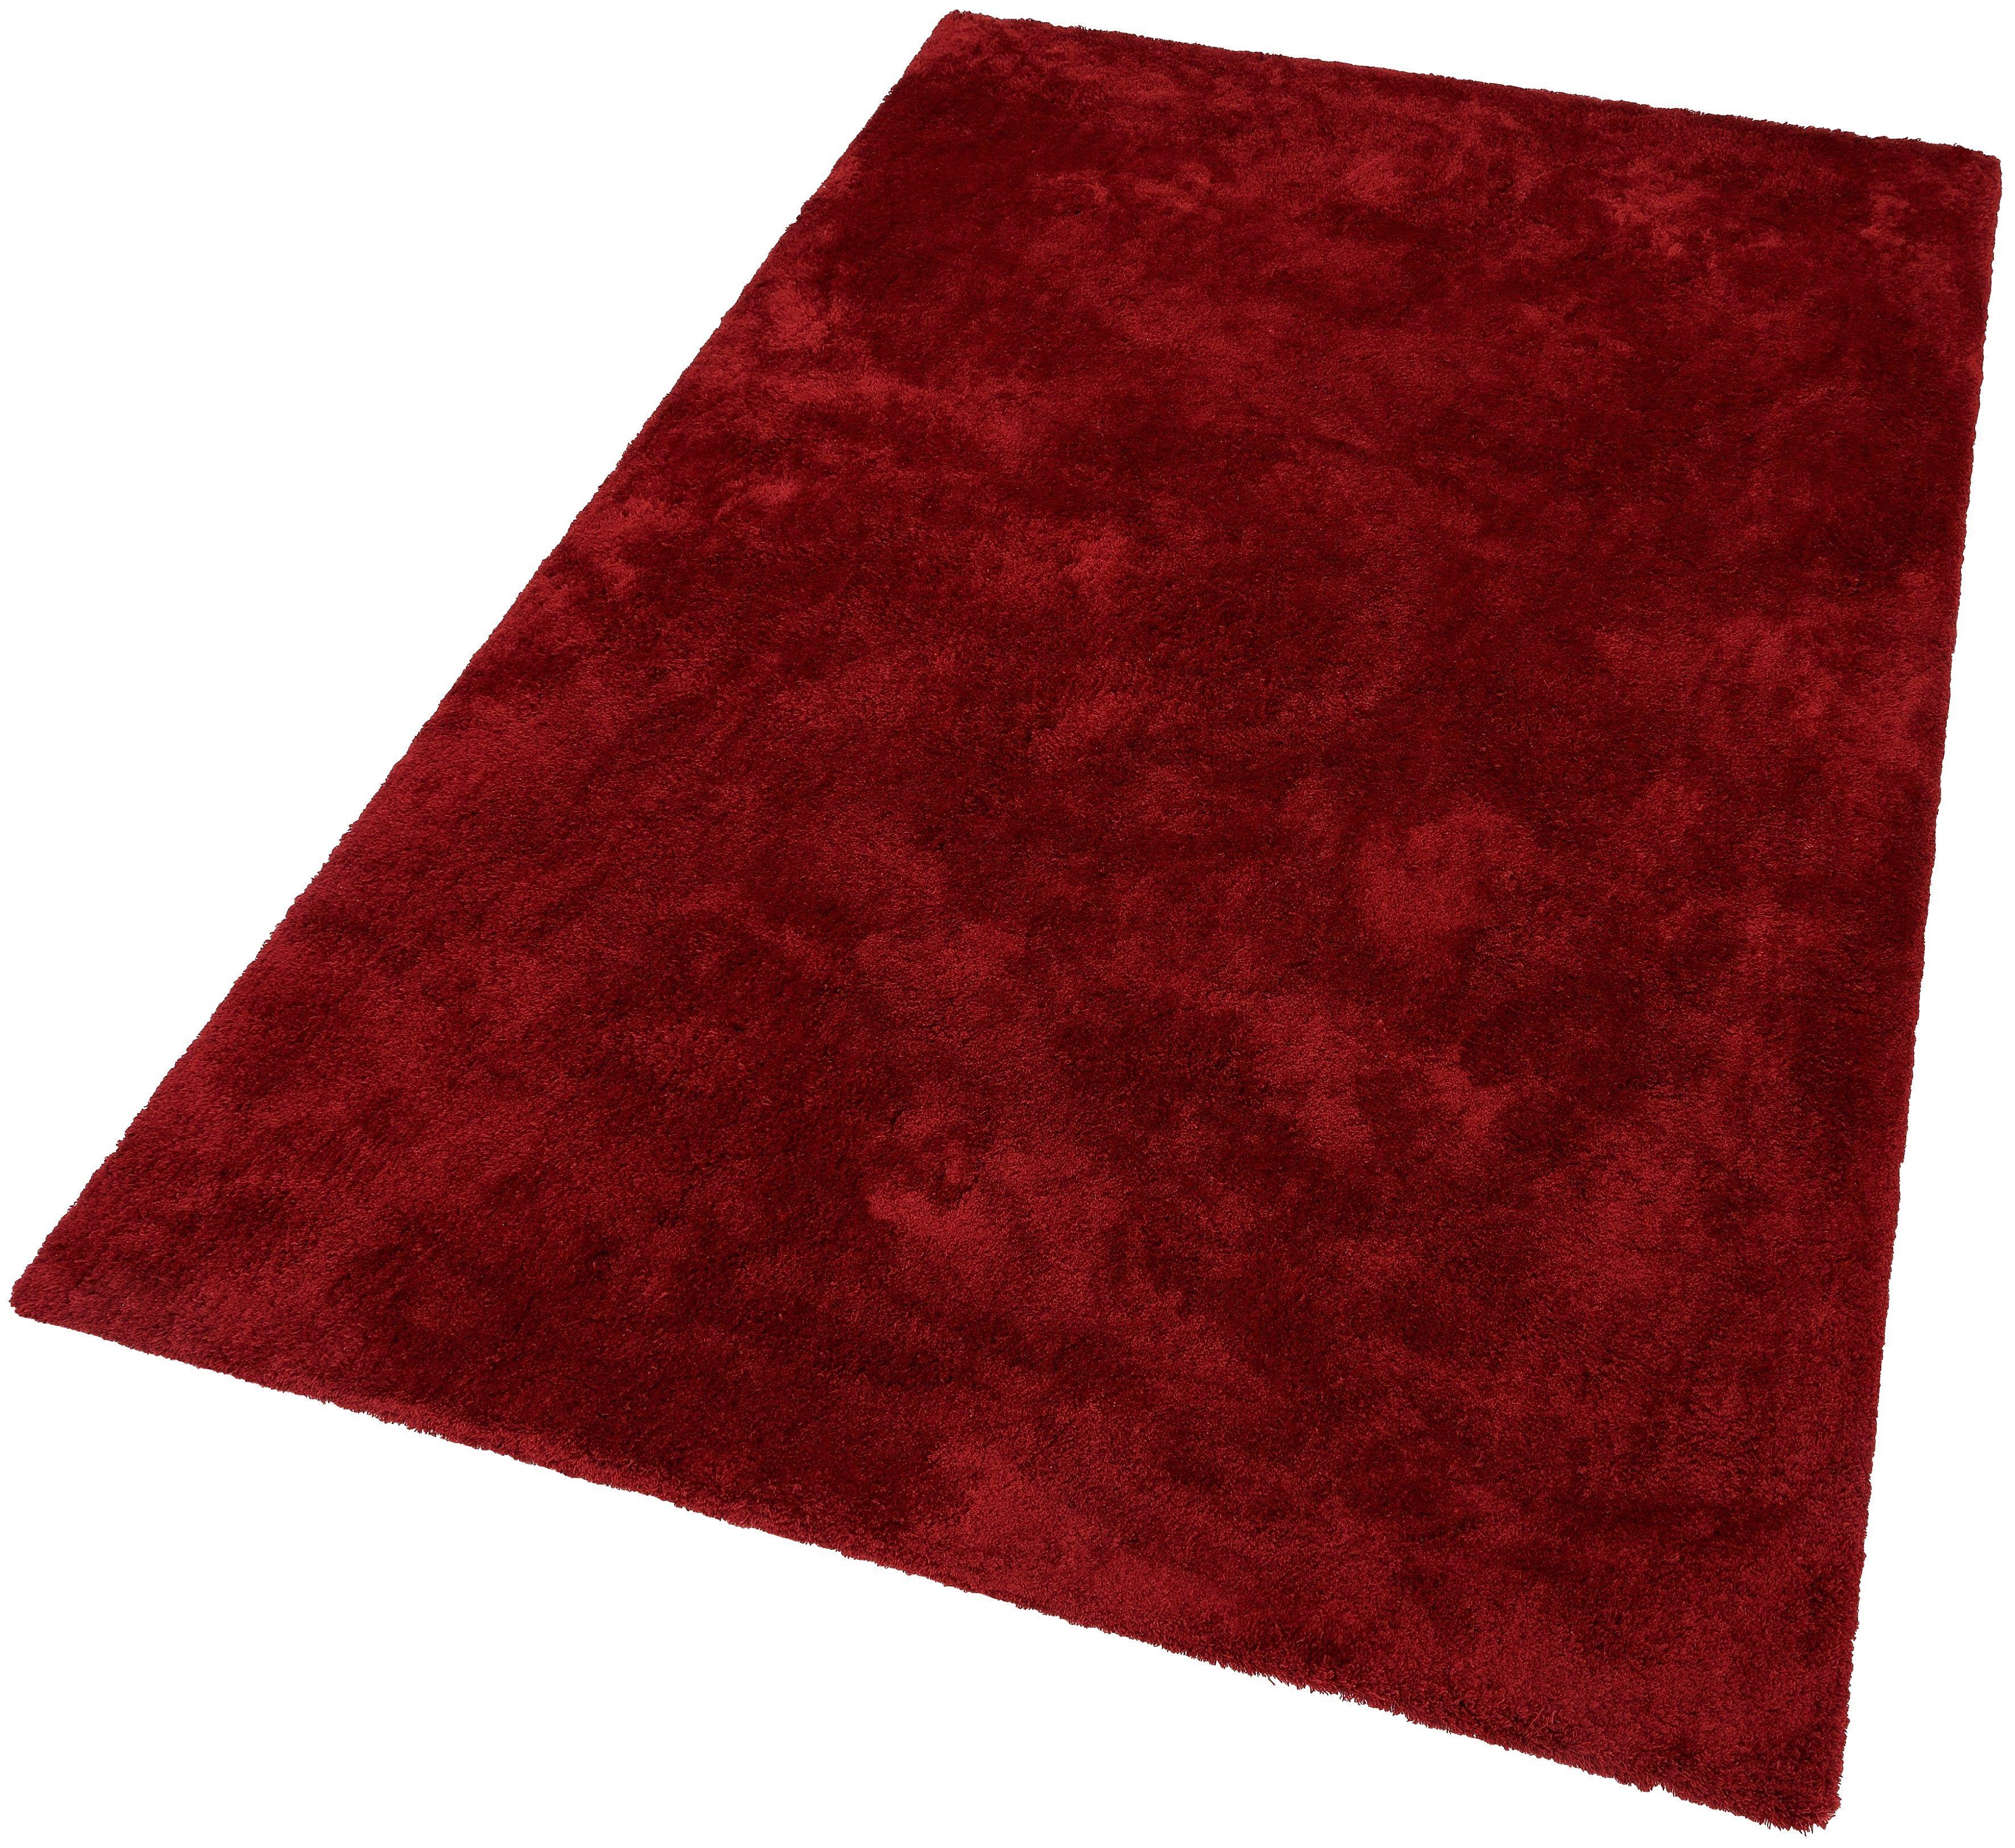 Hochflorteppich My Home Selection Magong Höhe 25 Mm Maschinengetuftet Jetzt Bestellen Unter Https Moebel Ladendirek Teppich Textilien Hochflor Teppich